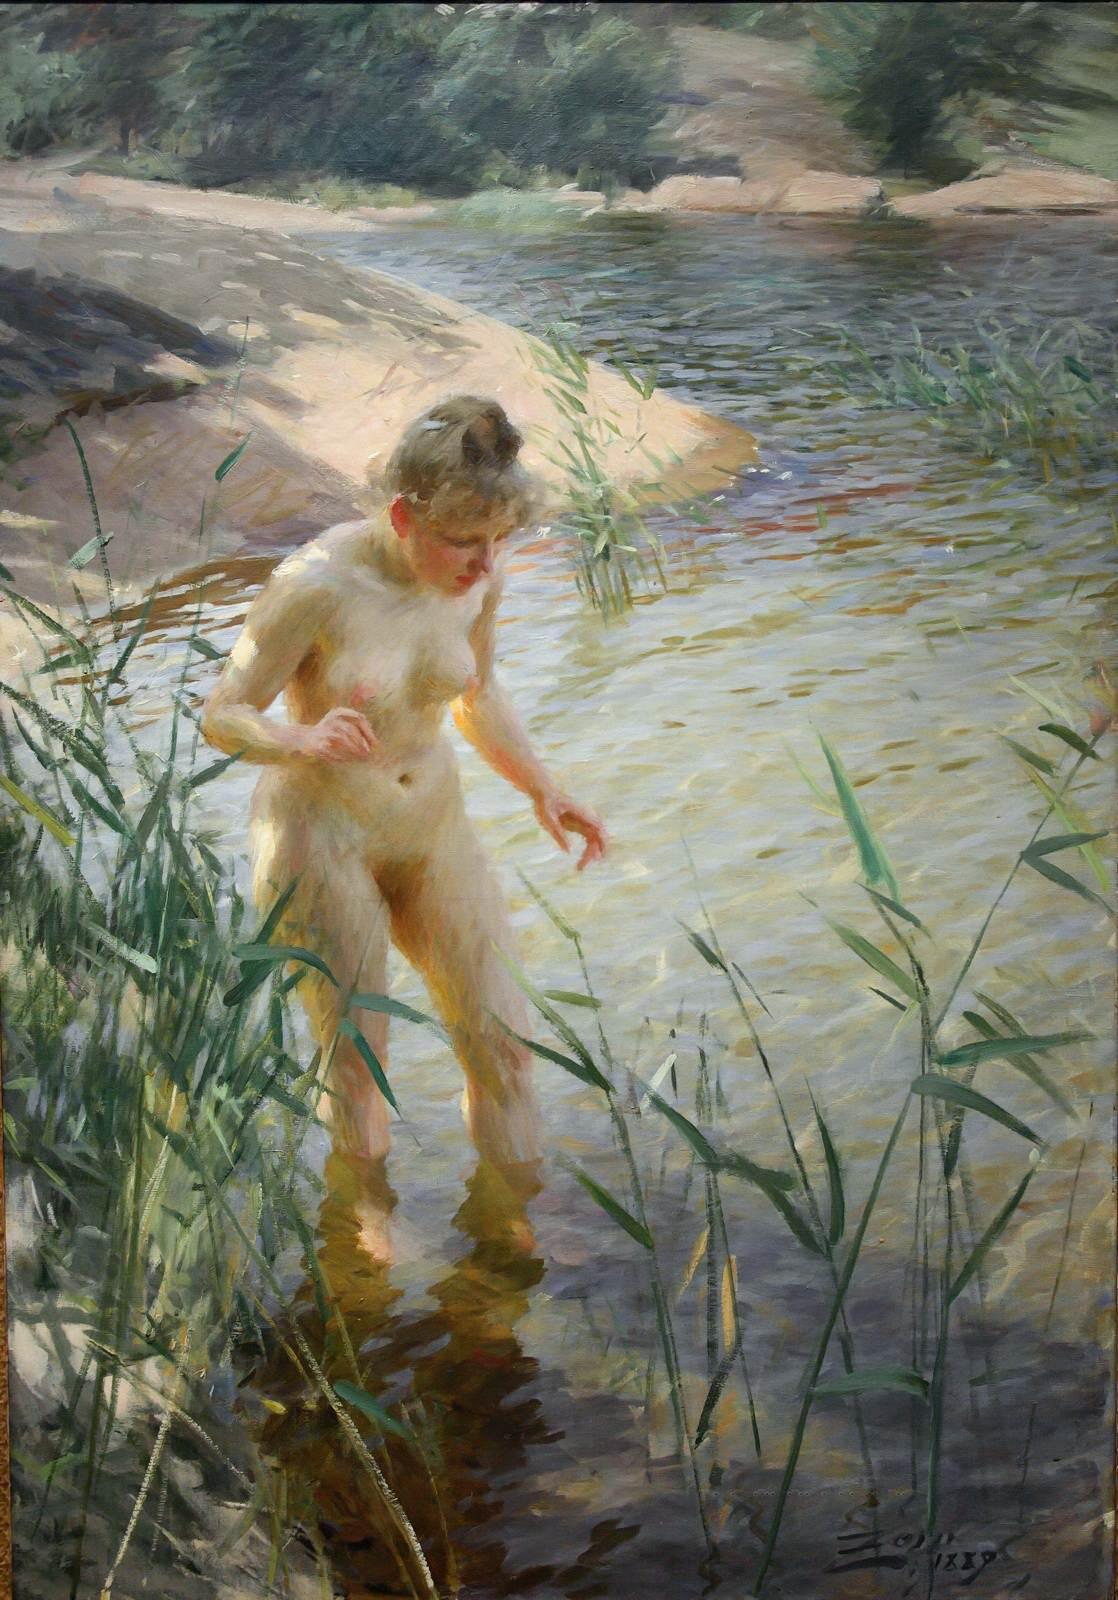 Anders Leonard Zorn. 1860-1920. Рефлекс. 1889, 120 x 84 см. Мура, Музей Цорна